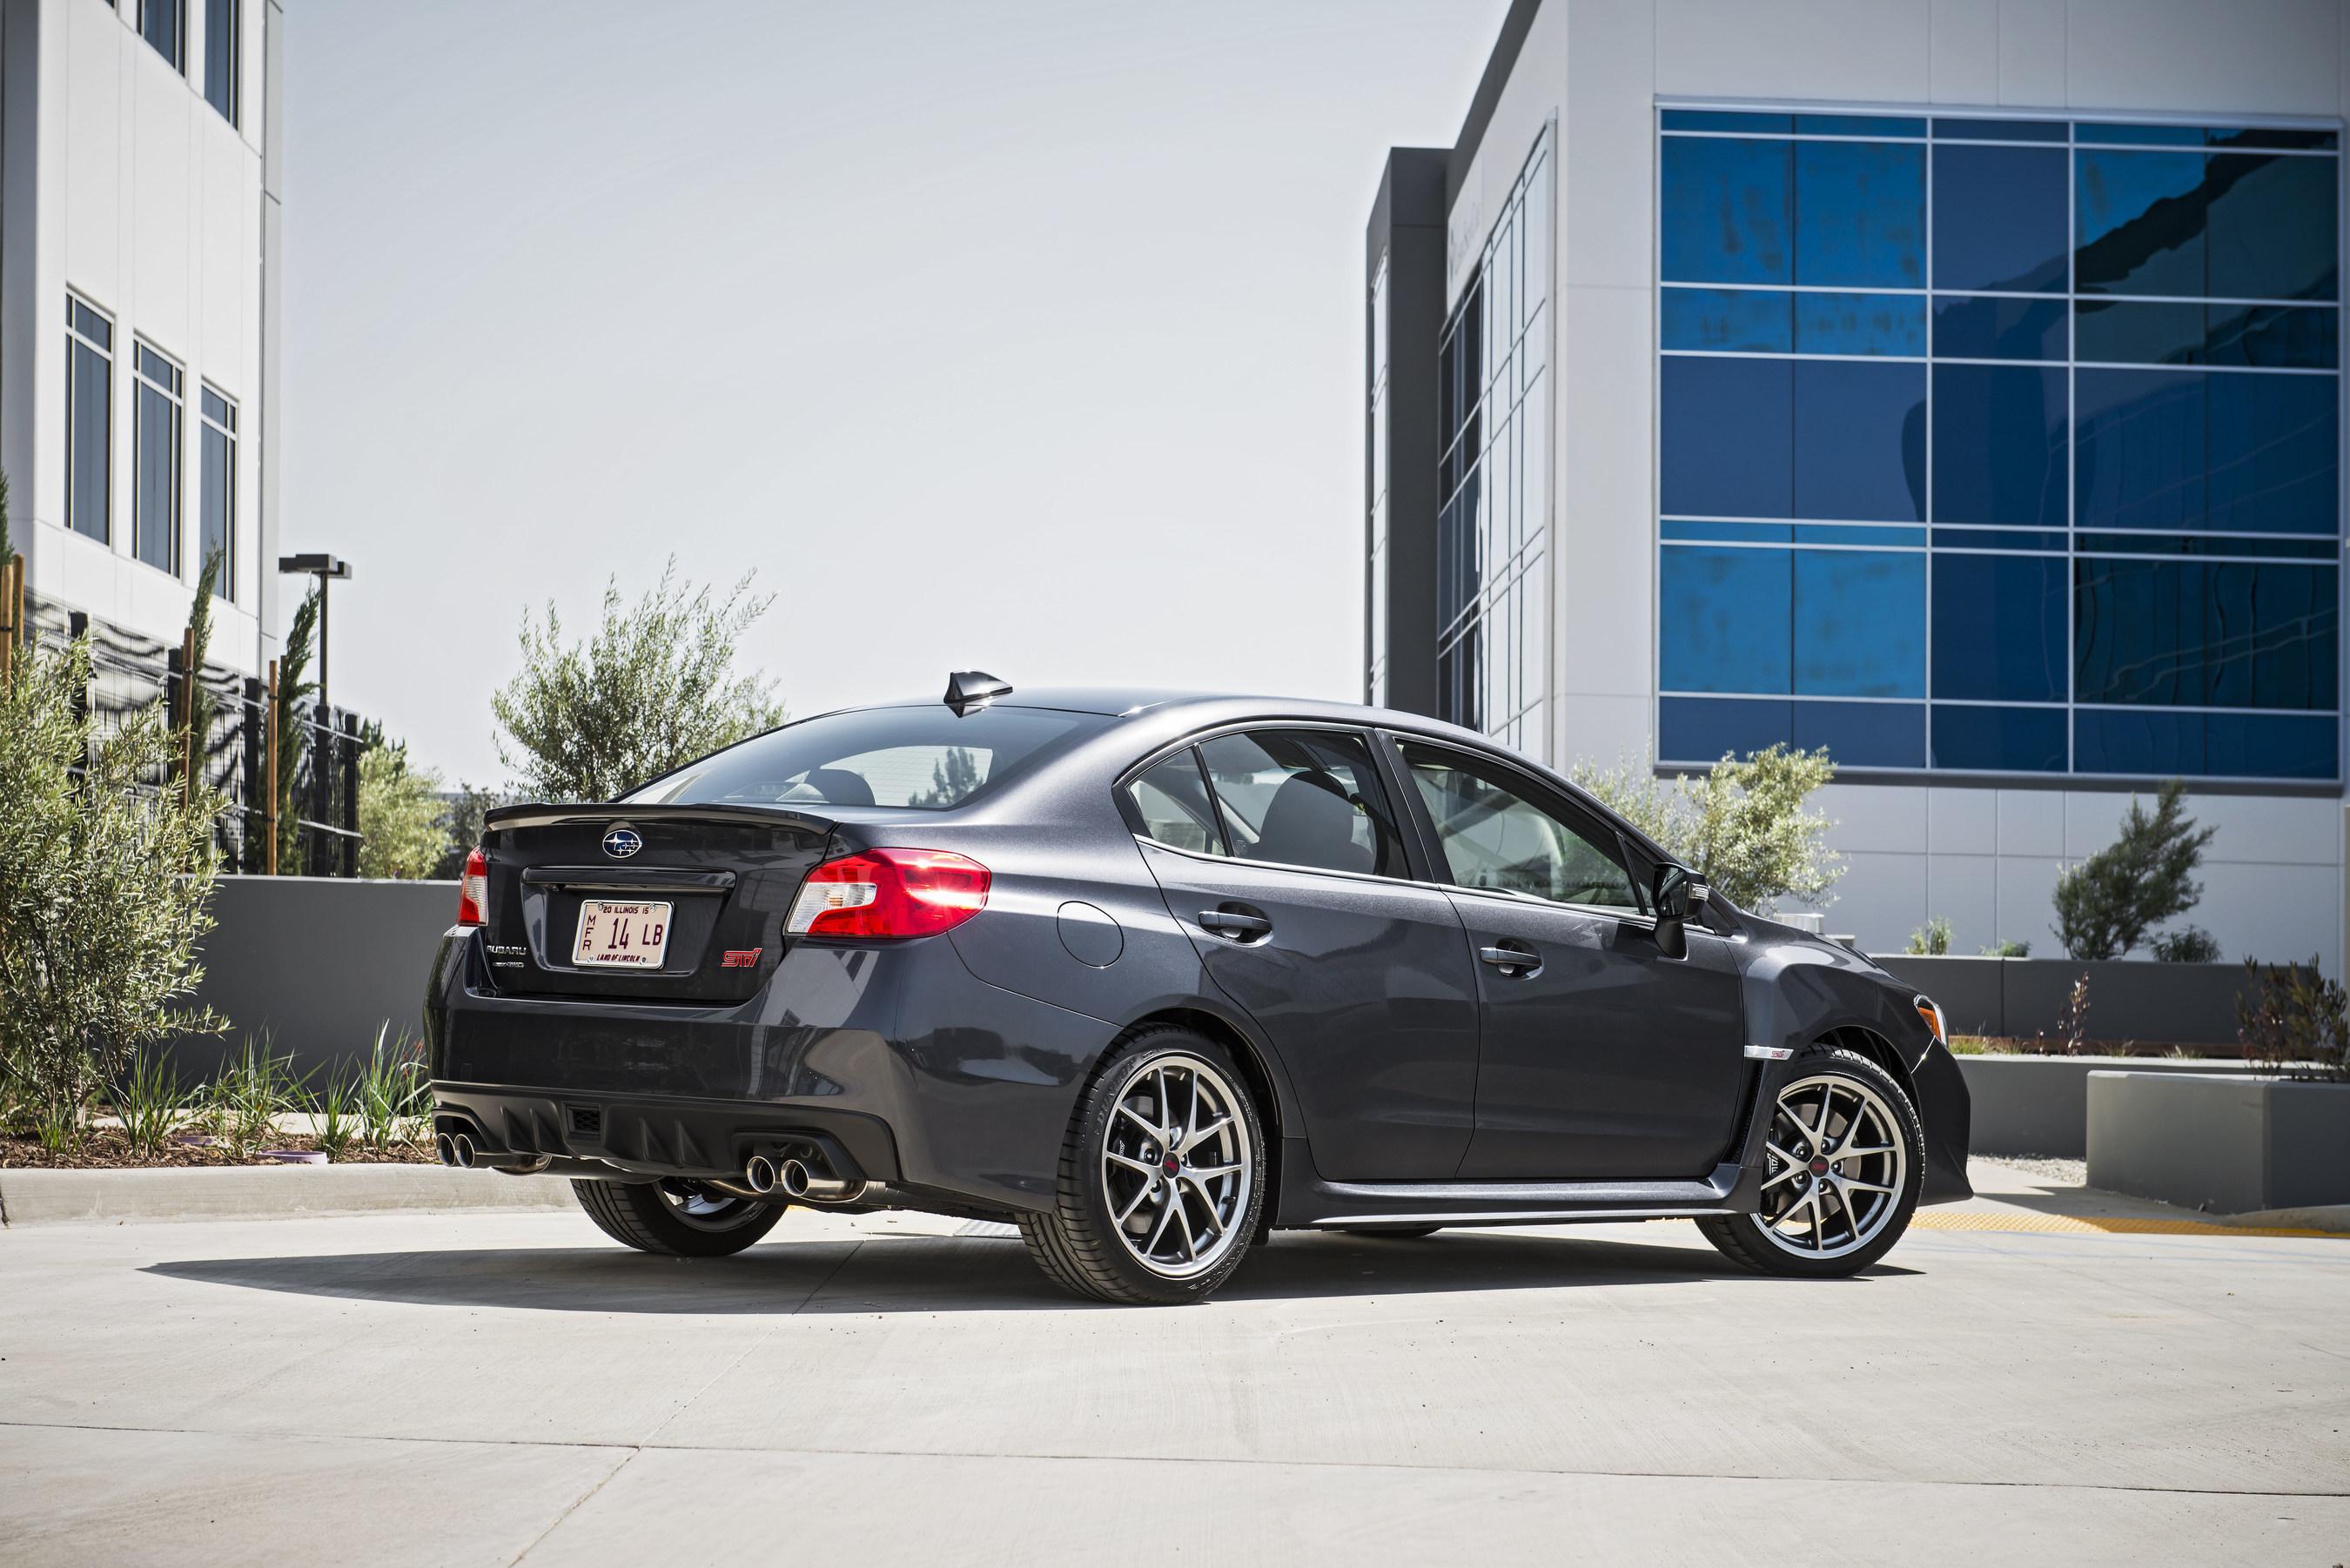 [SCHEMATICS_48DE]  Subaru Introduces 2016 WRX® And WRX STI® Models, Offering EyeSight® Driver  Assist Technology And Subaru STARLINK™ Infotainment | 2016 Subaru Wrx Without Wing |  | PR Newswire